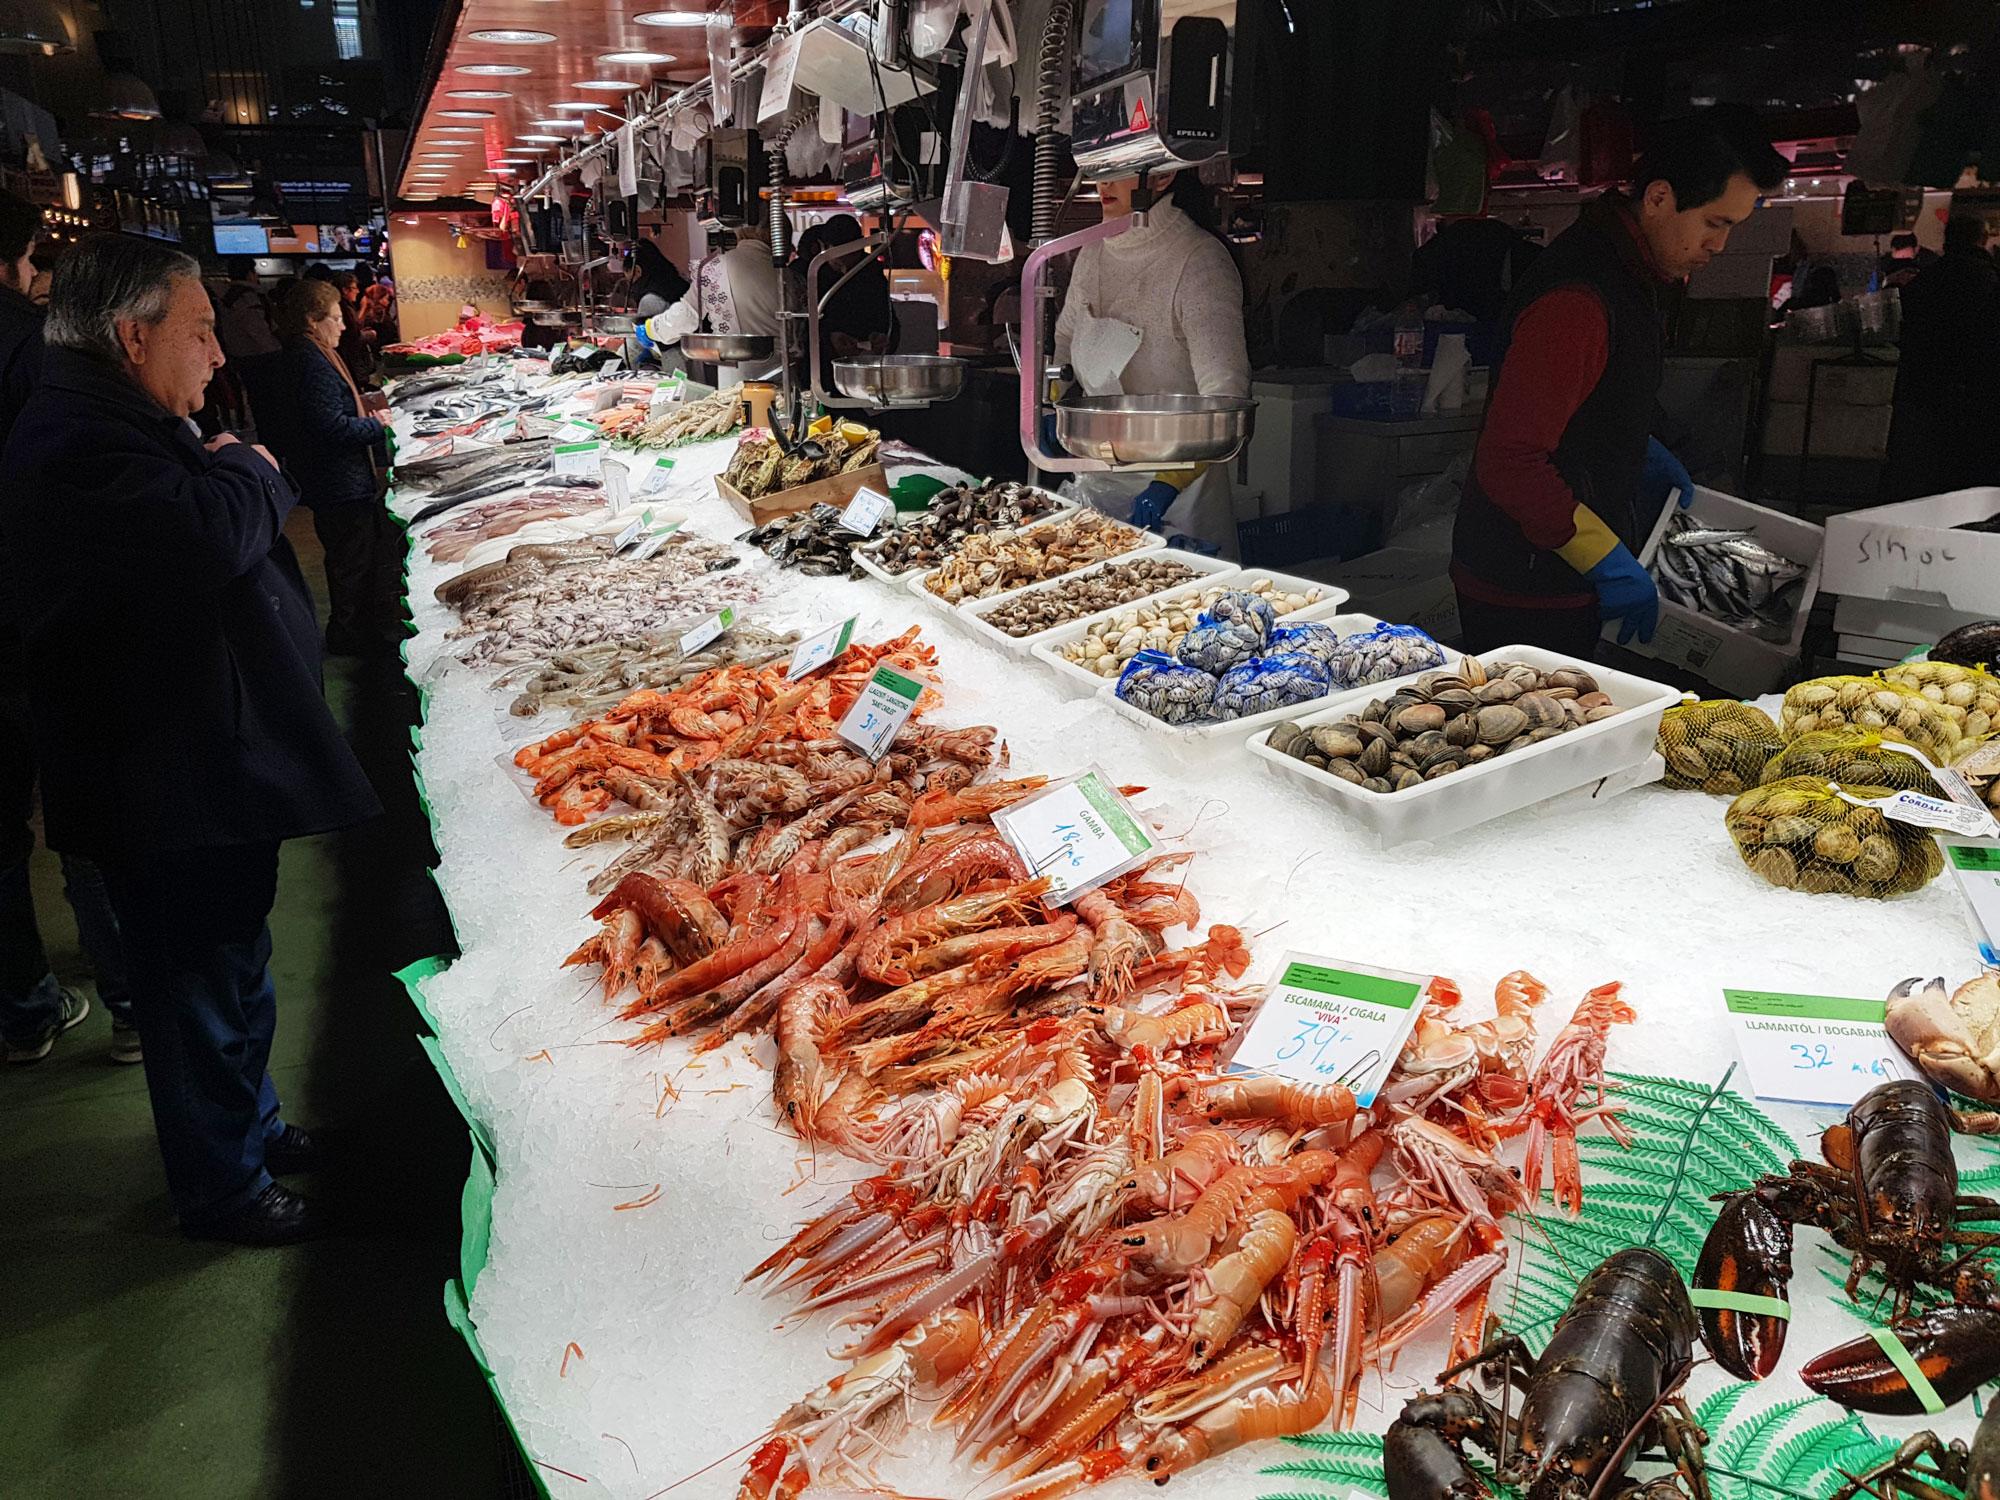 fisk-skalldyr-la-Boqueria-barcelona